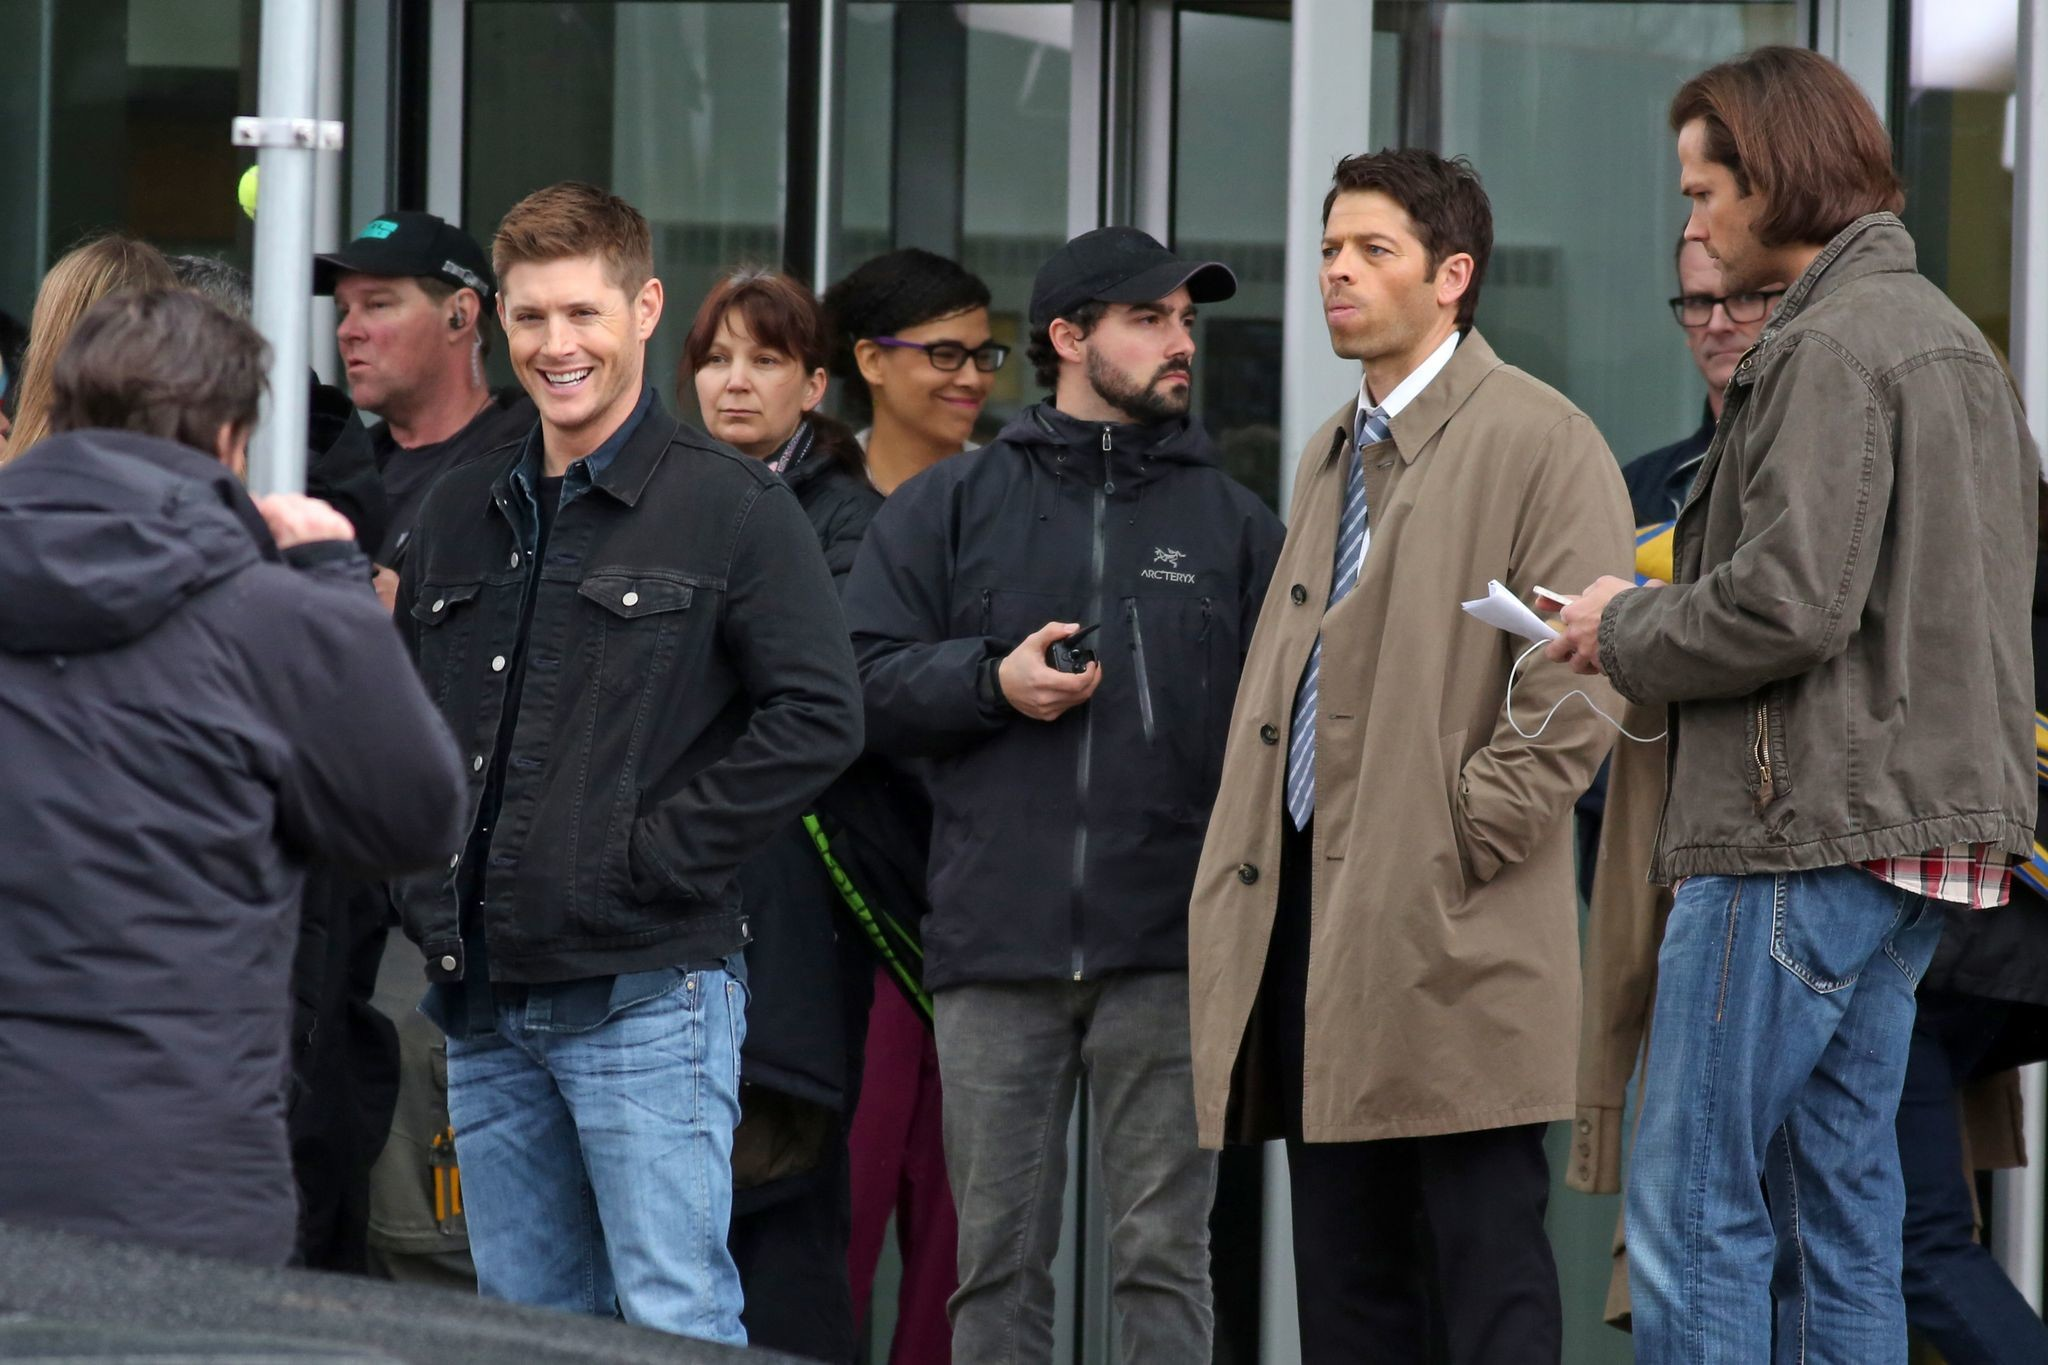 Jensen Ackles Jared Padalecki Misha Collins   jensen-ackles-jared-padalecki -and